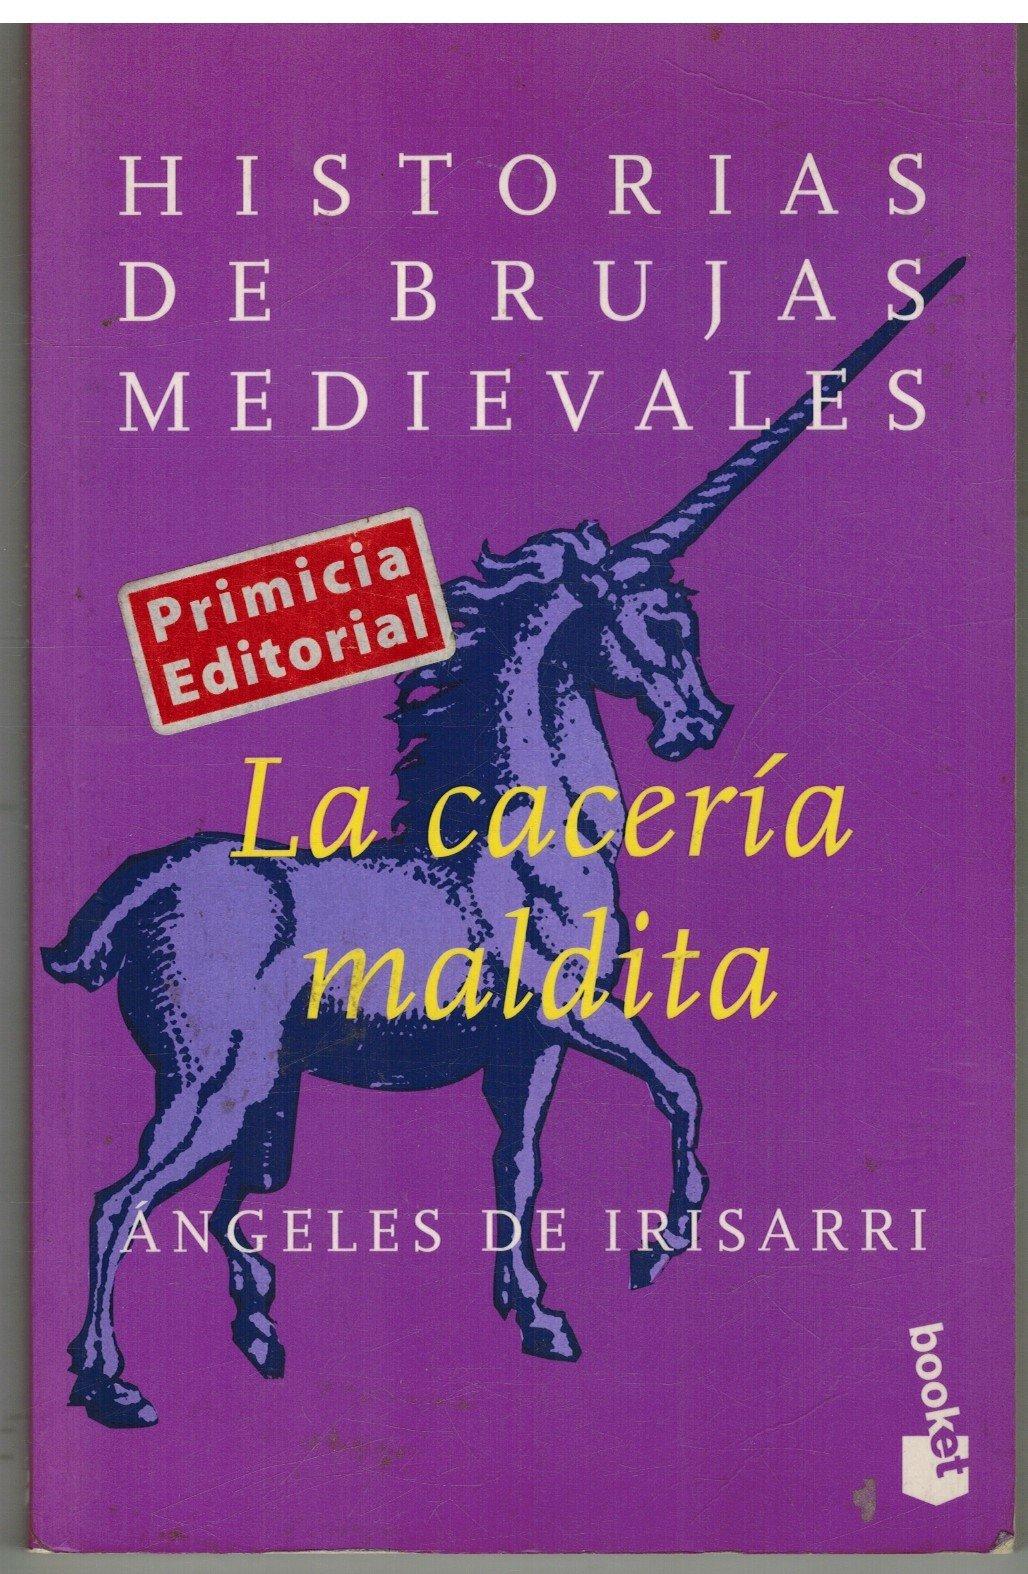 La caceria maldita (booket): Amazon.es: Irisarri, Angeles: Libros